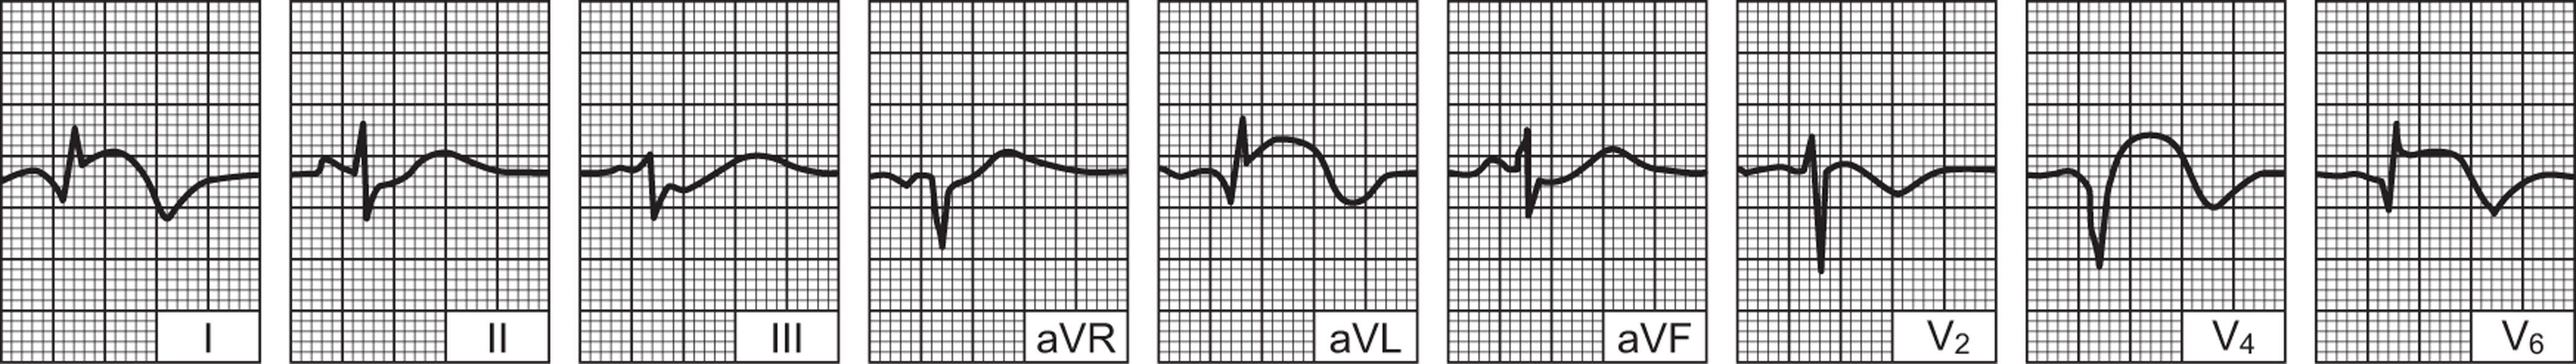 ekg hipertenzije i infarkt miokarda